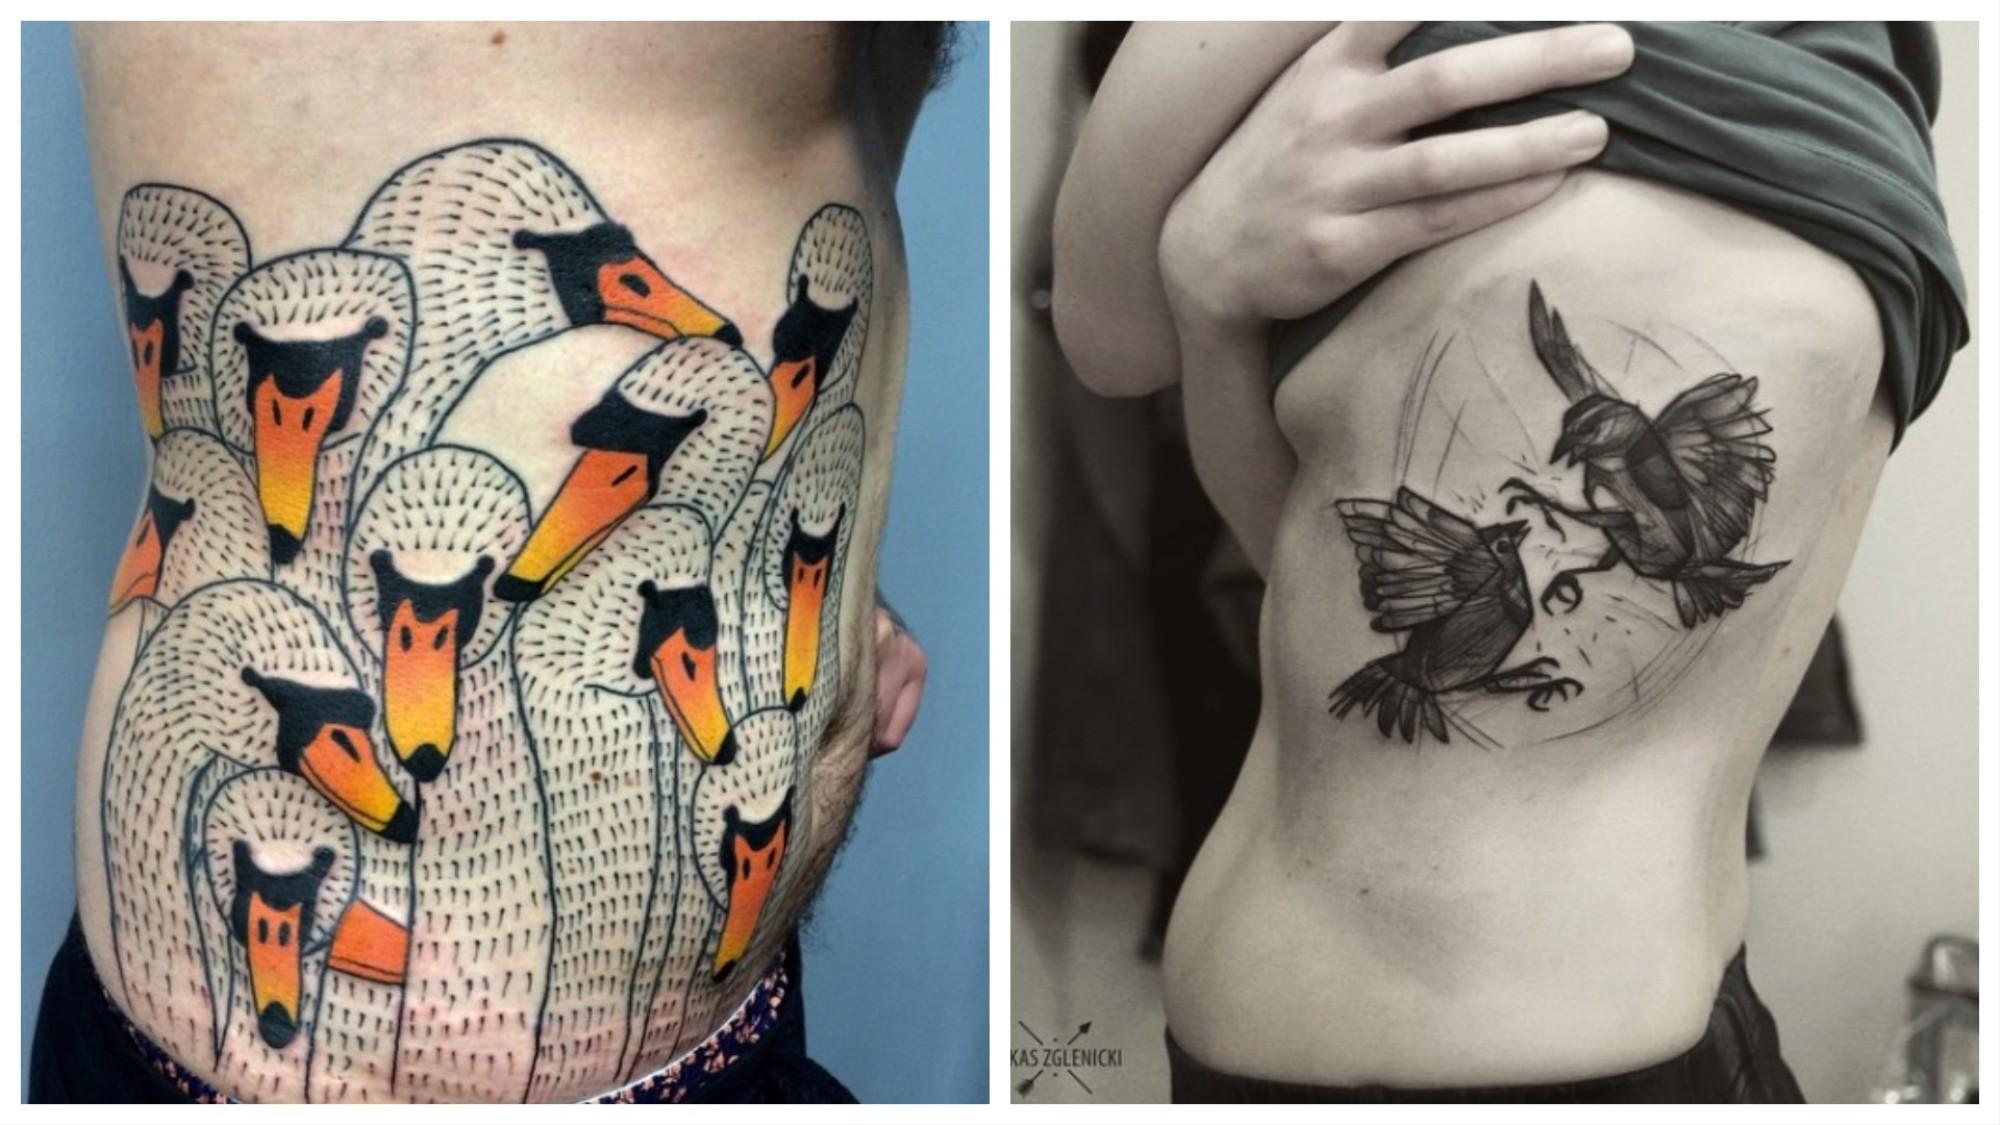 Polscy Tatuażyści Cz 2 I D